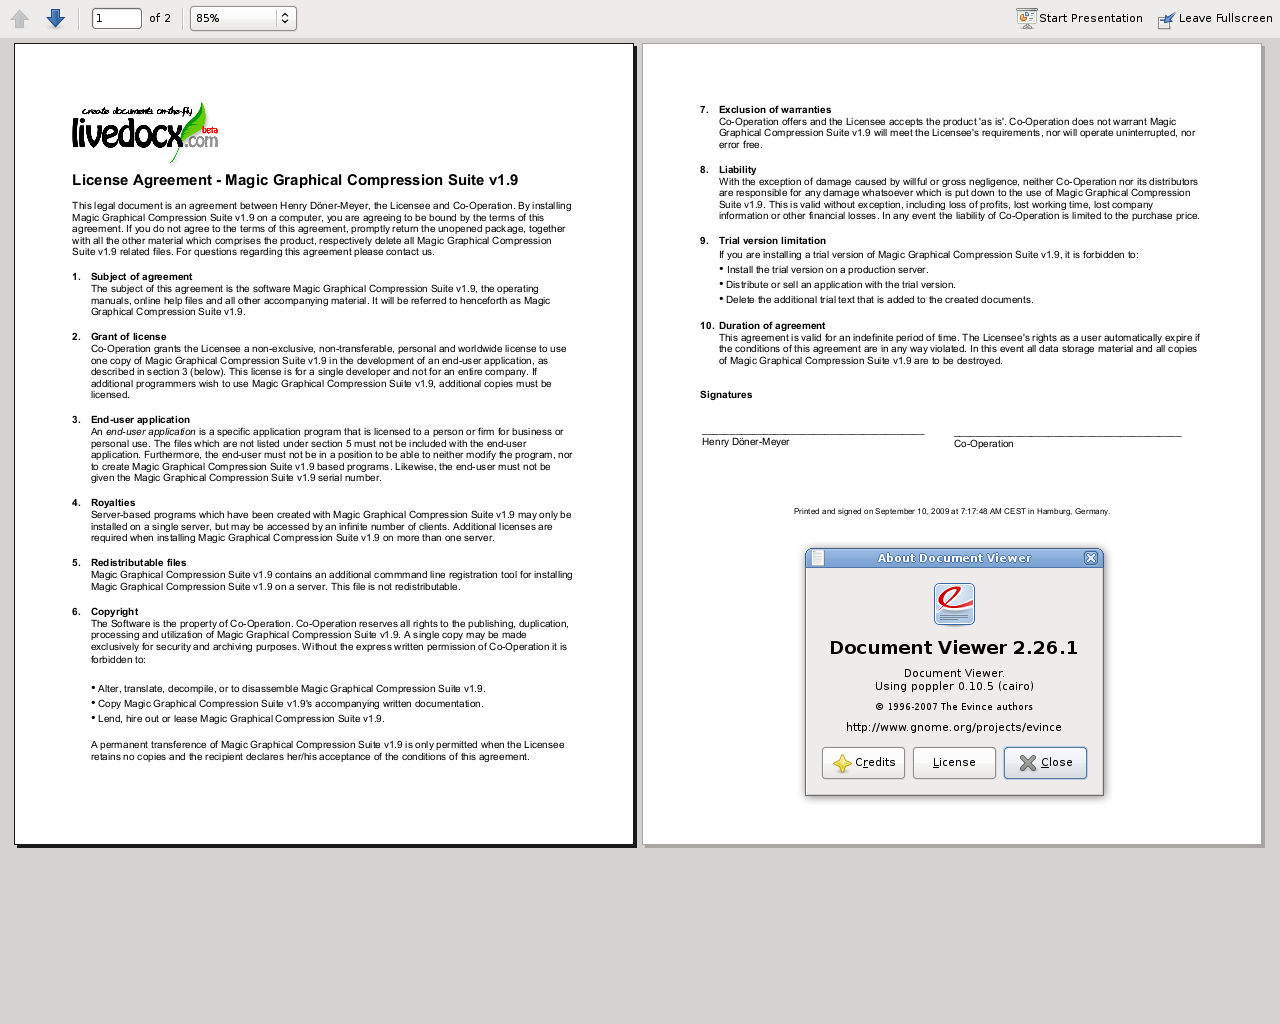 zendservice livedocx zend framework 2 2 4 13dev documentation